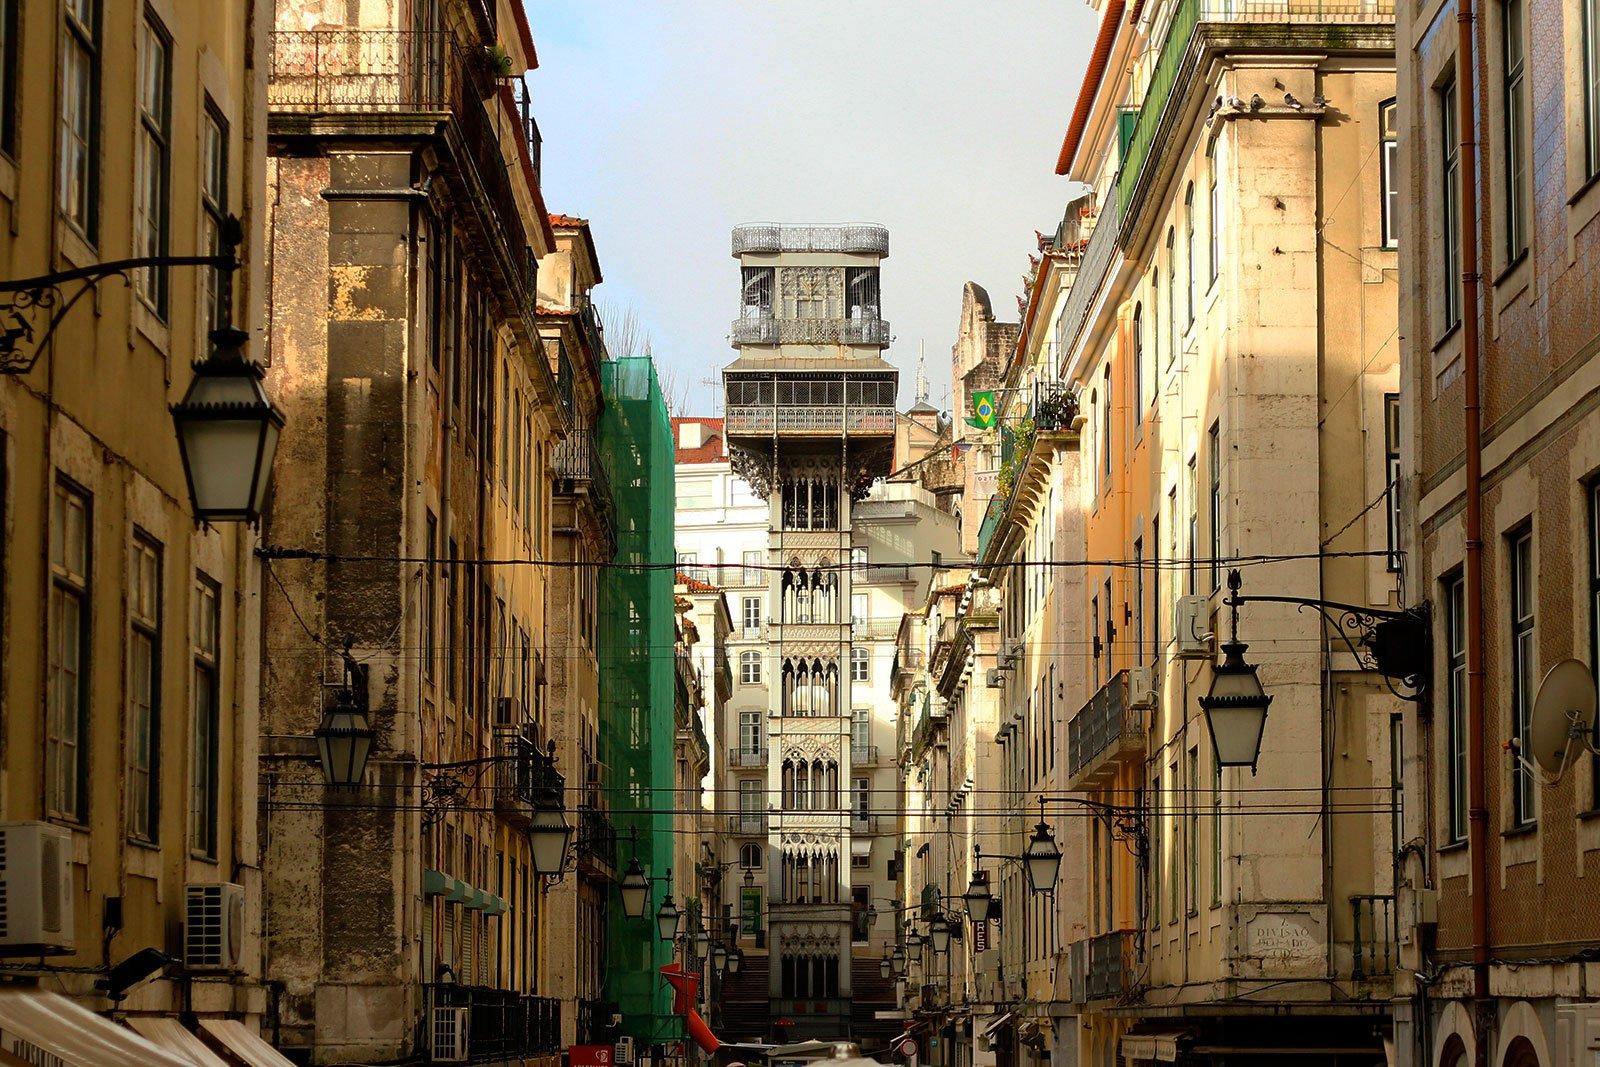 Elevador di Santa Justa, Lisbon on alto do pina lisbon, portugal lisbon, santos-o-velho lisbon, prazeres lisbon, campo grande lisbon, castelo lisbon, alvalade lisbon,